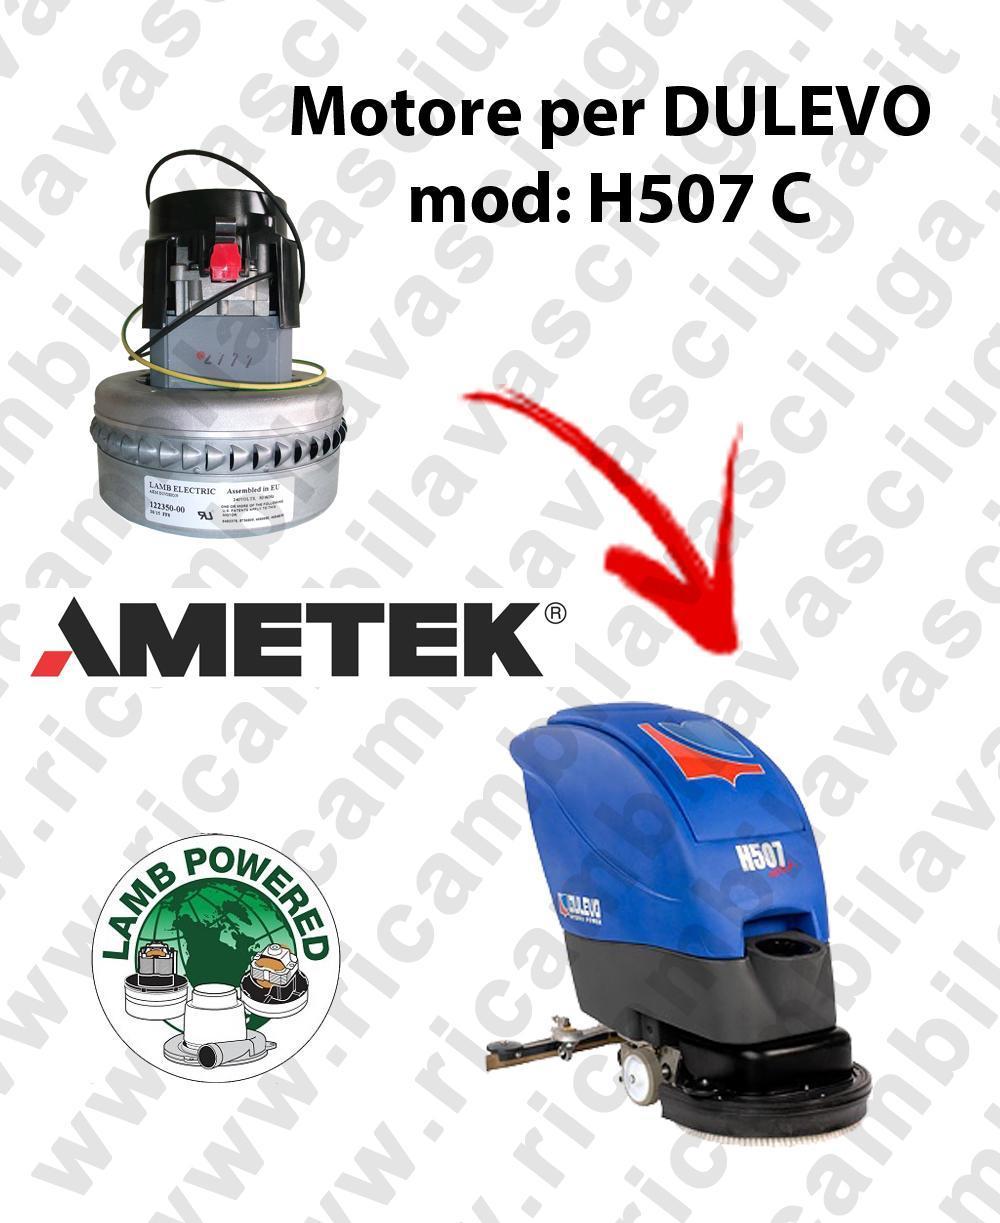 H507 C Motore de aspiración LAMB AMETEK para fregadora DULEVO